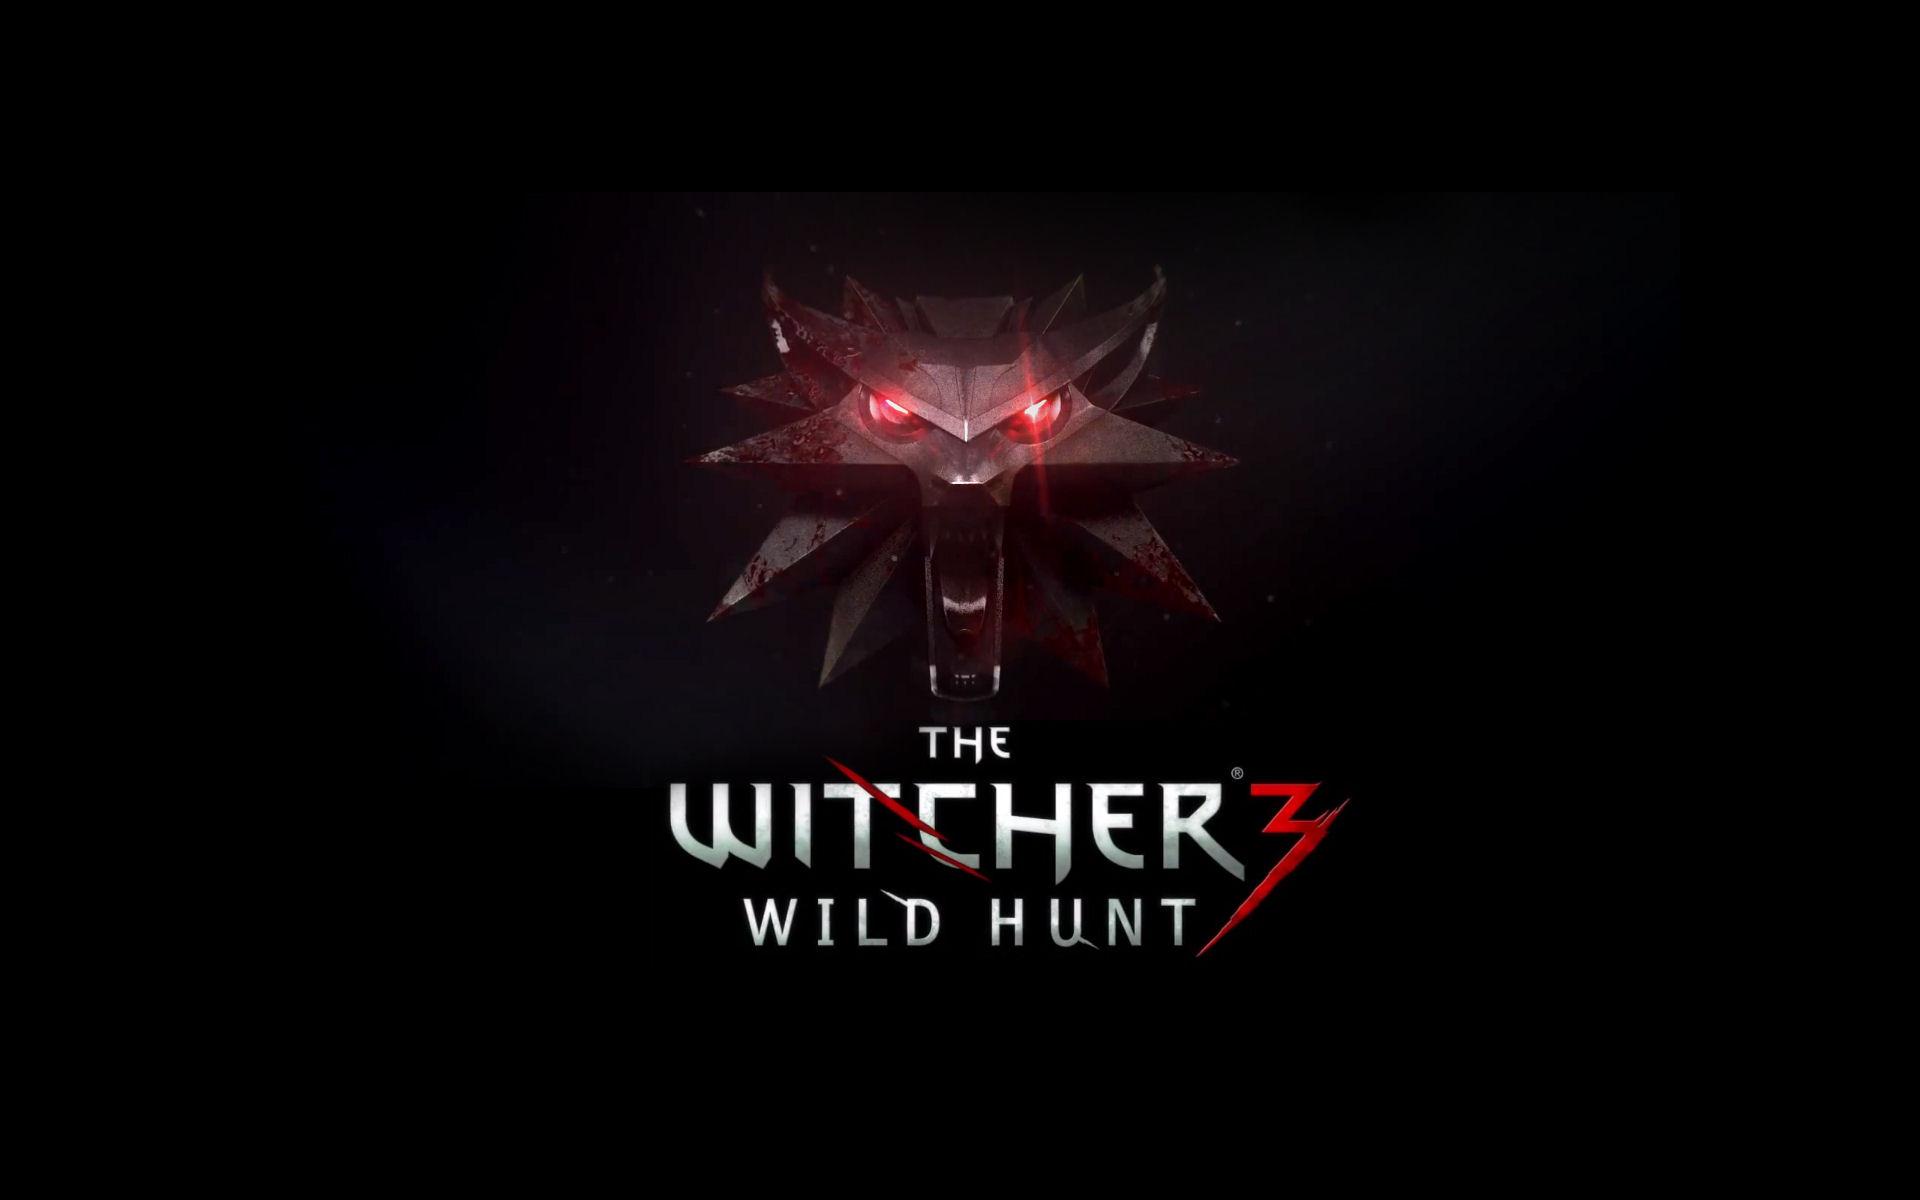 The Witcher 3 Wild Hunt Warner Bros Interactive